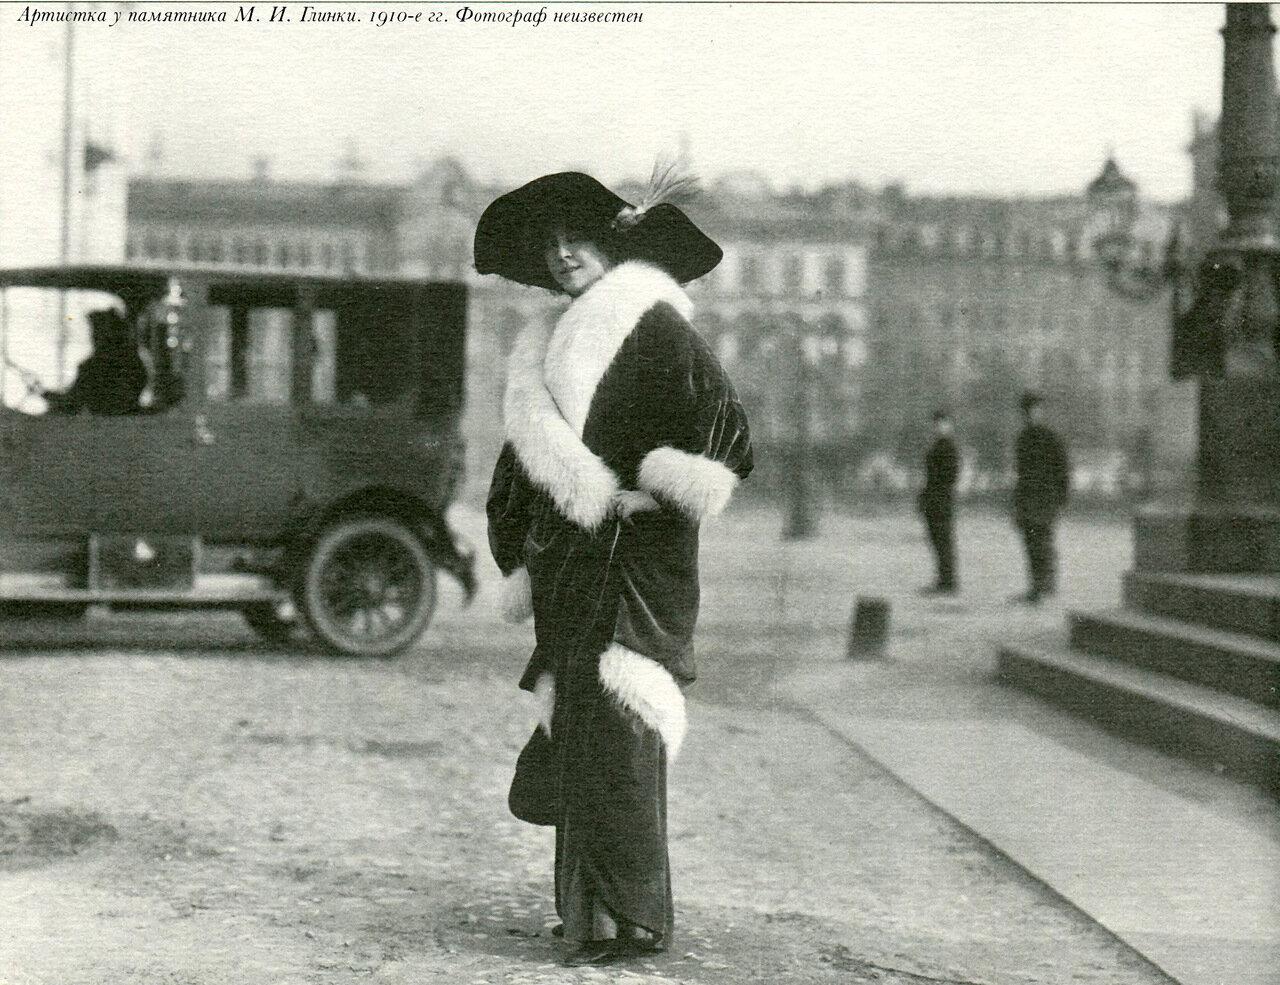 Артистка у памятника Глинки. Санкт-Петербург. 1910-е годы.